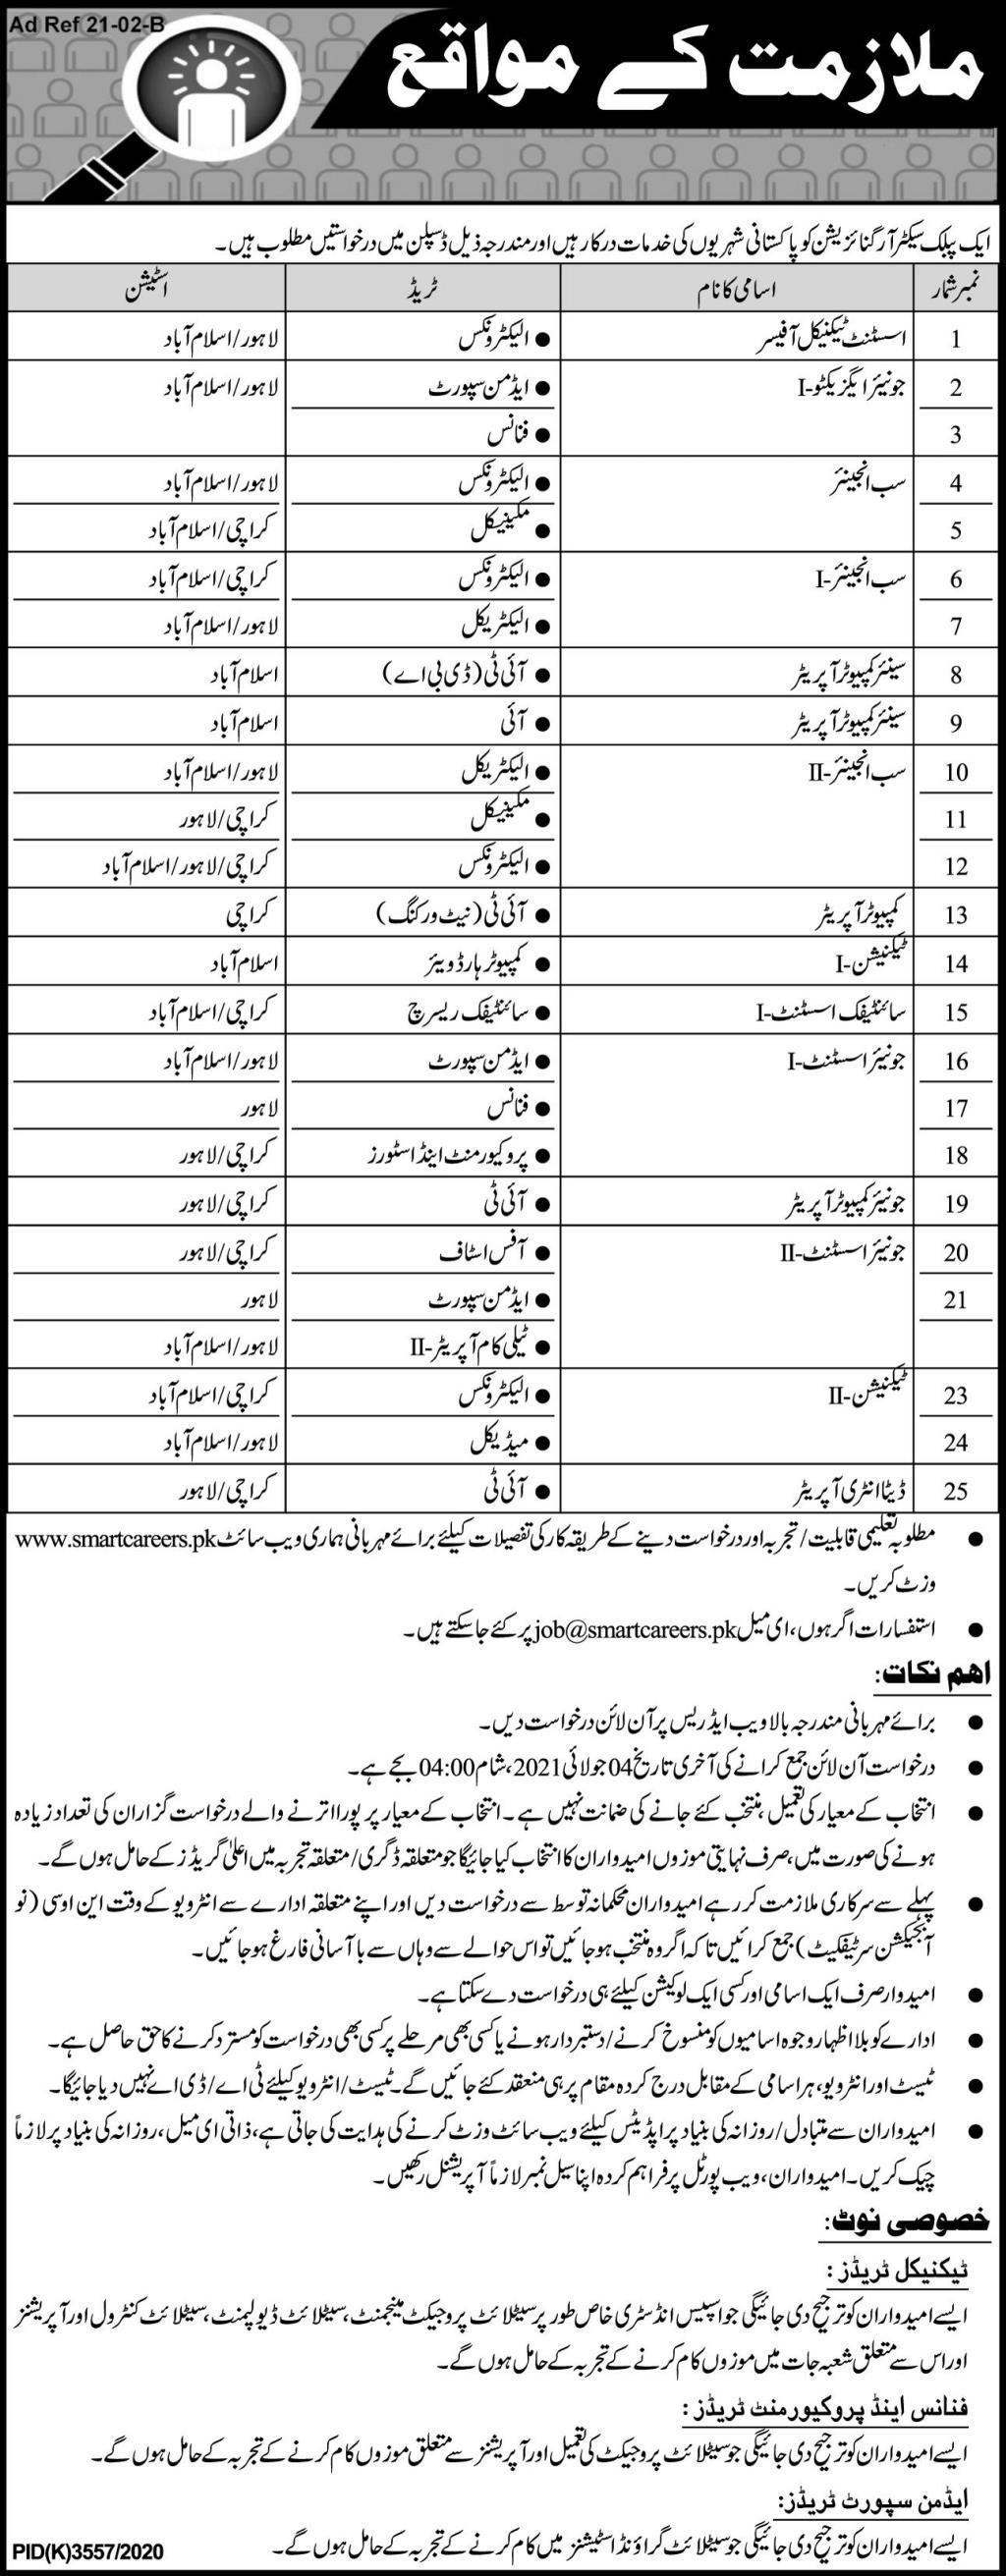 Public Sector Organization Government Of Pakistan Jobs 2021